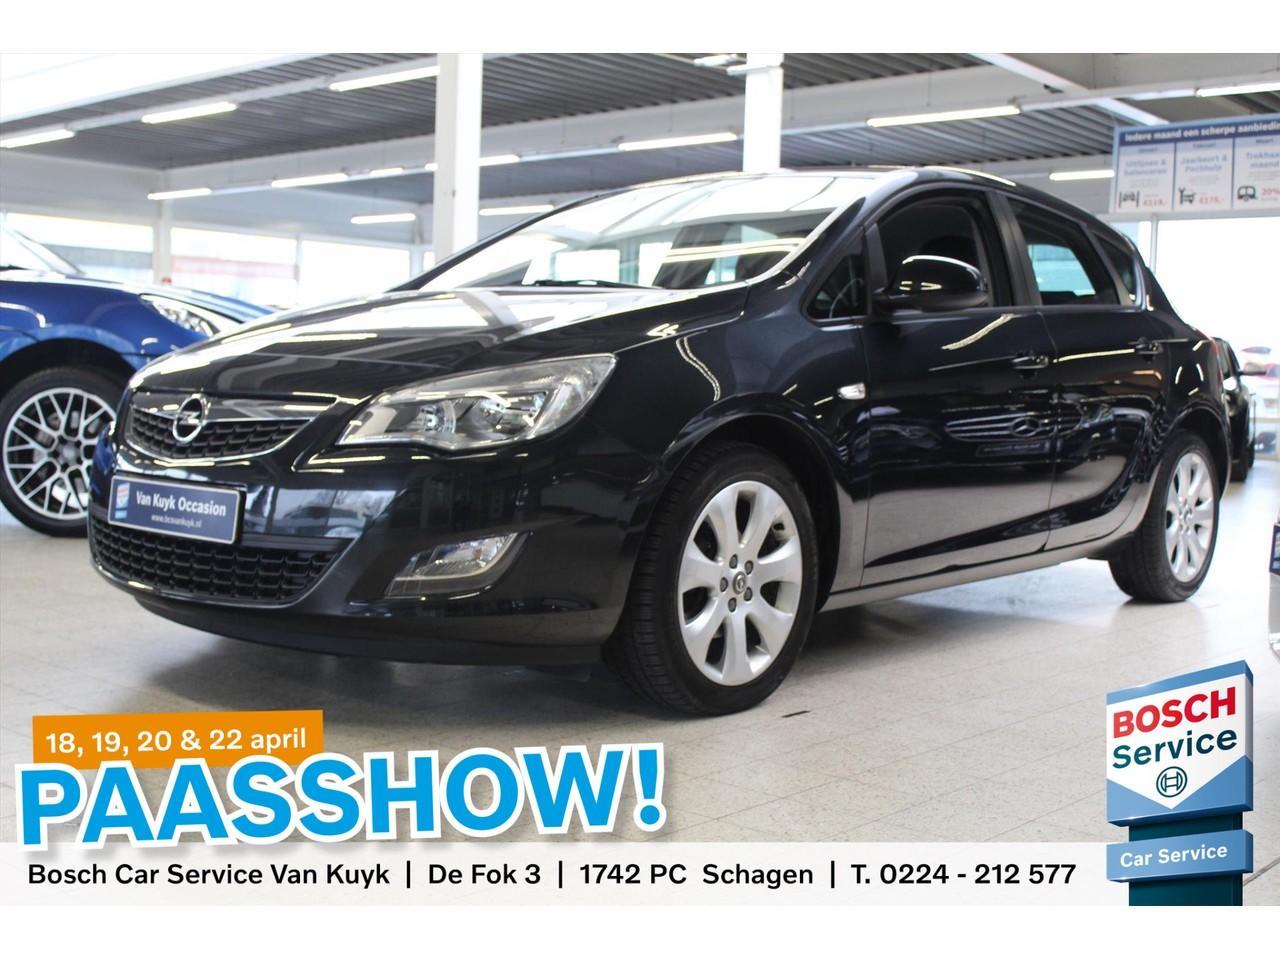 Opel Astra 1.4 turbo 140pk 5d airco / navigatie / 17